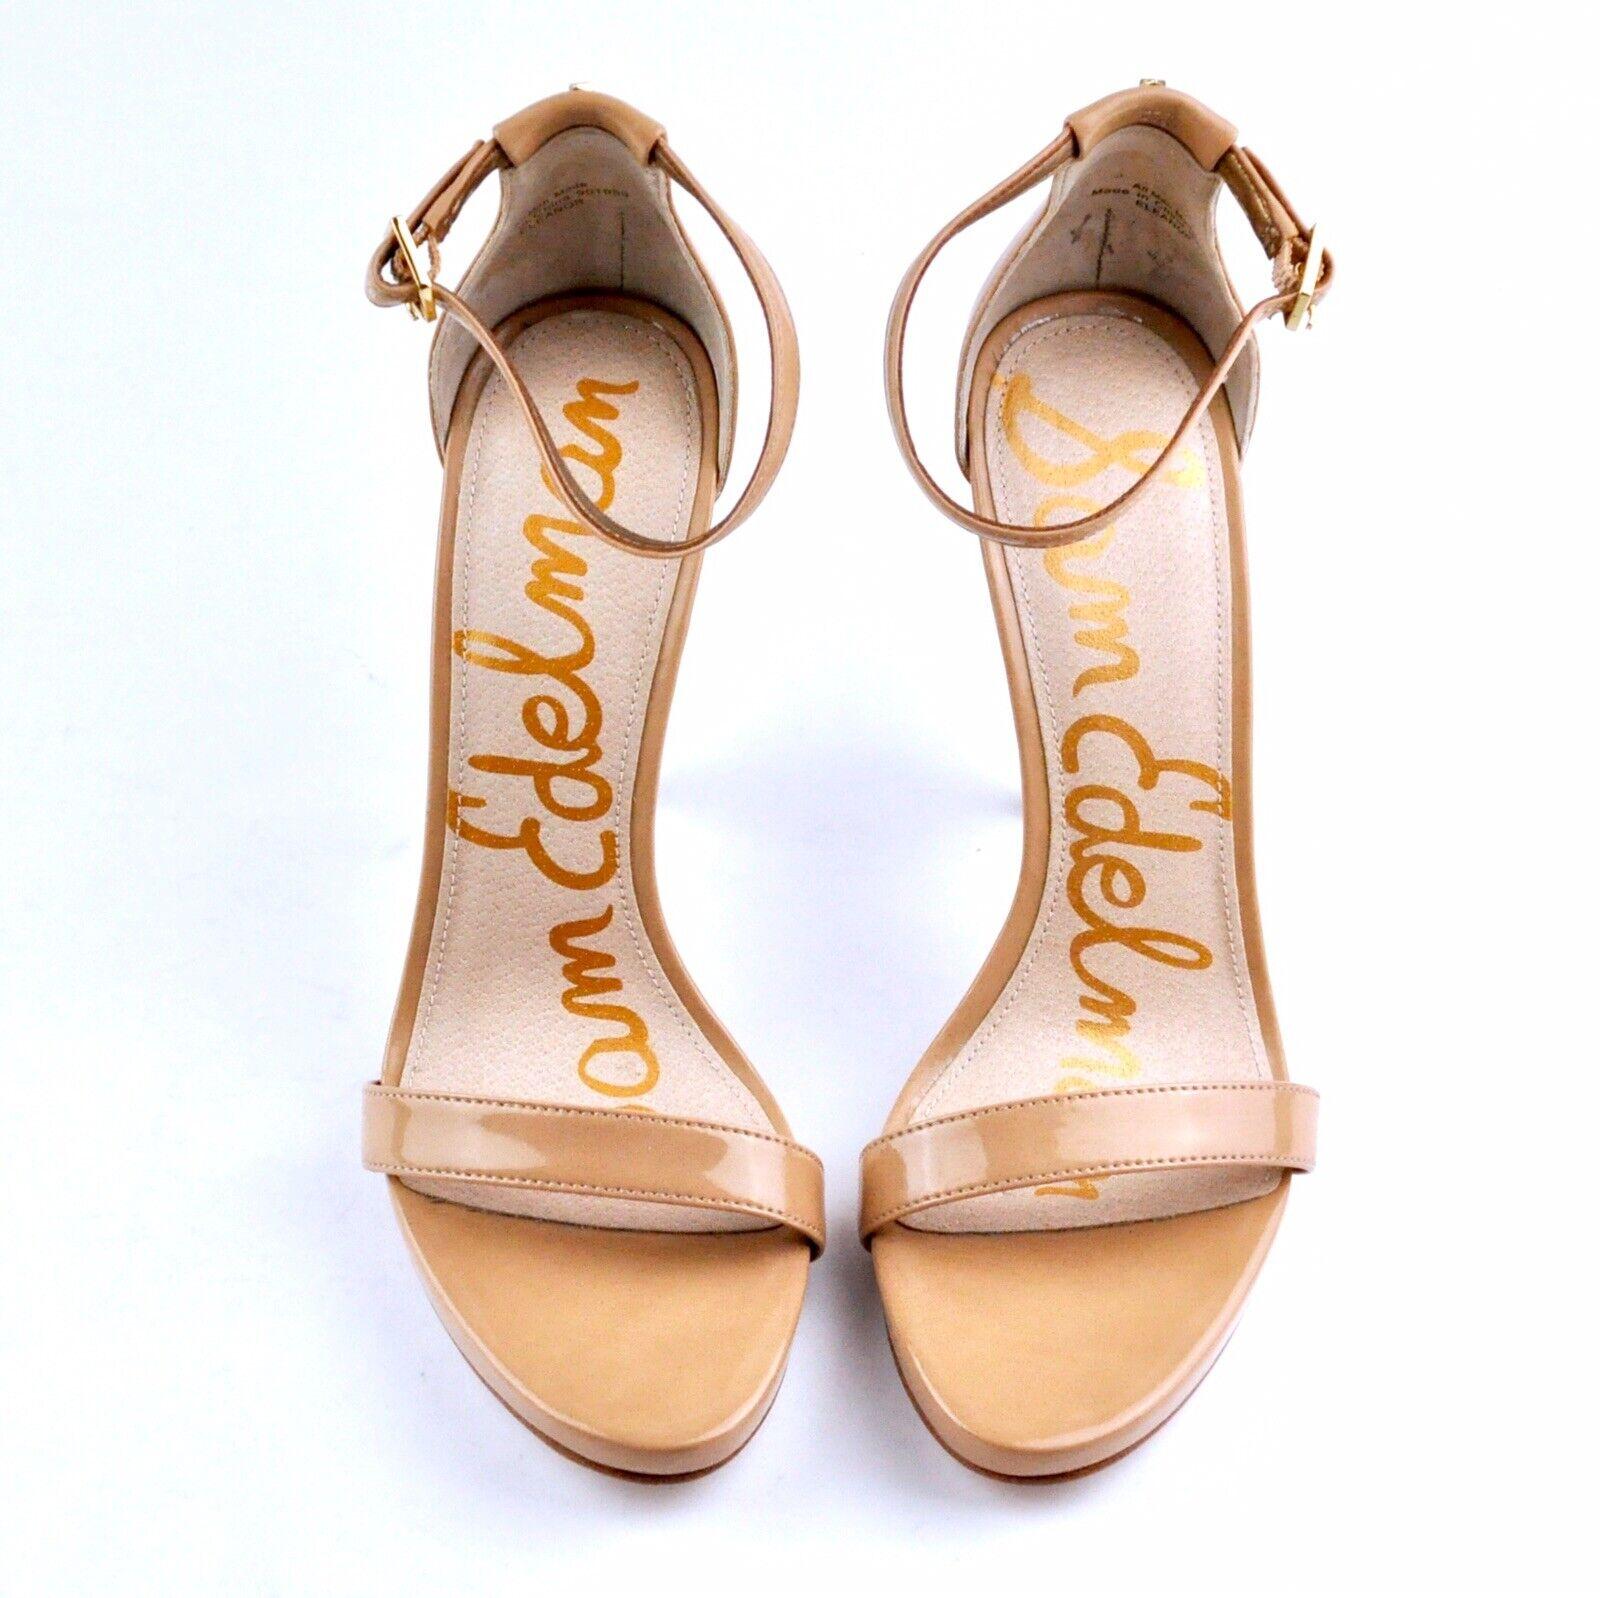 Sam Edelman Edelman Edelman Eleanor Ankle Strap Sandal